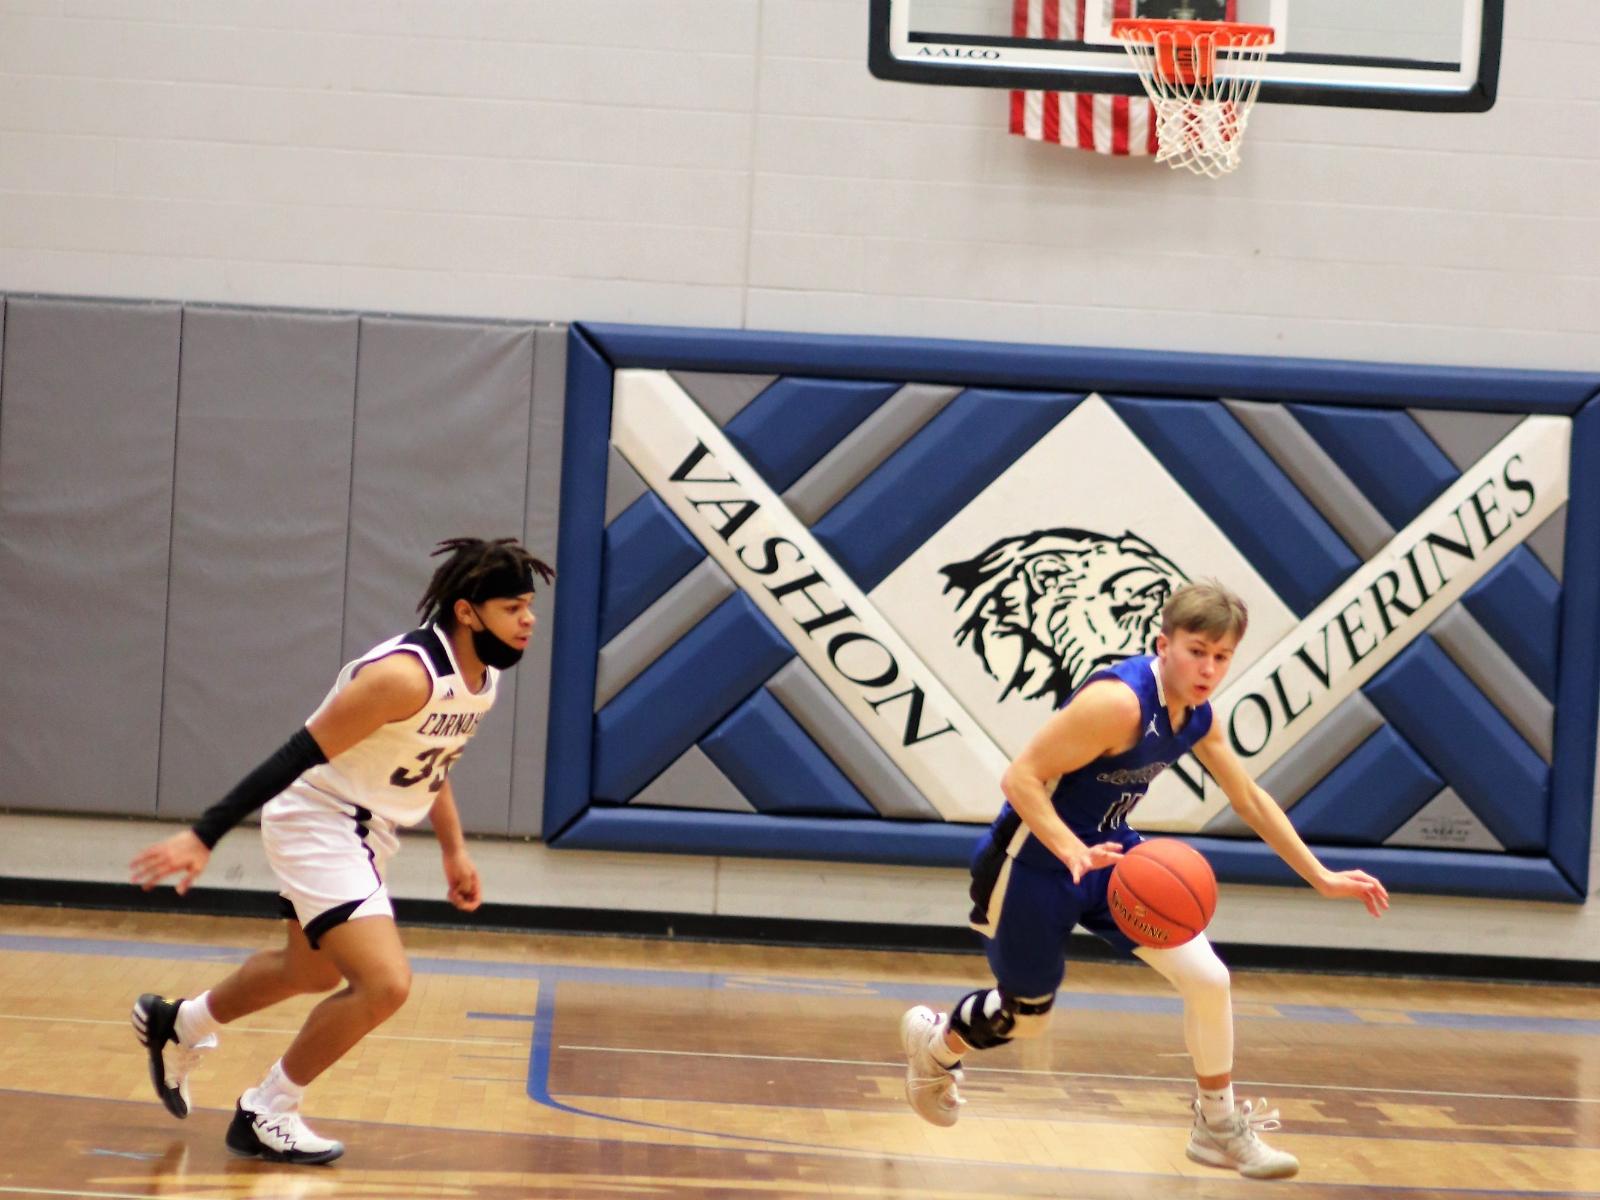 Varsity Boys' Basketball defeats Carnahan High School 60-50  @Vashon HS  2/20/21